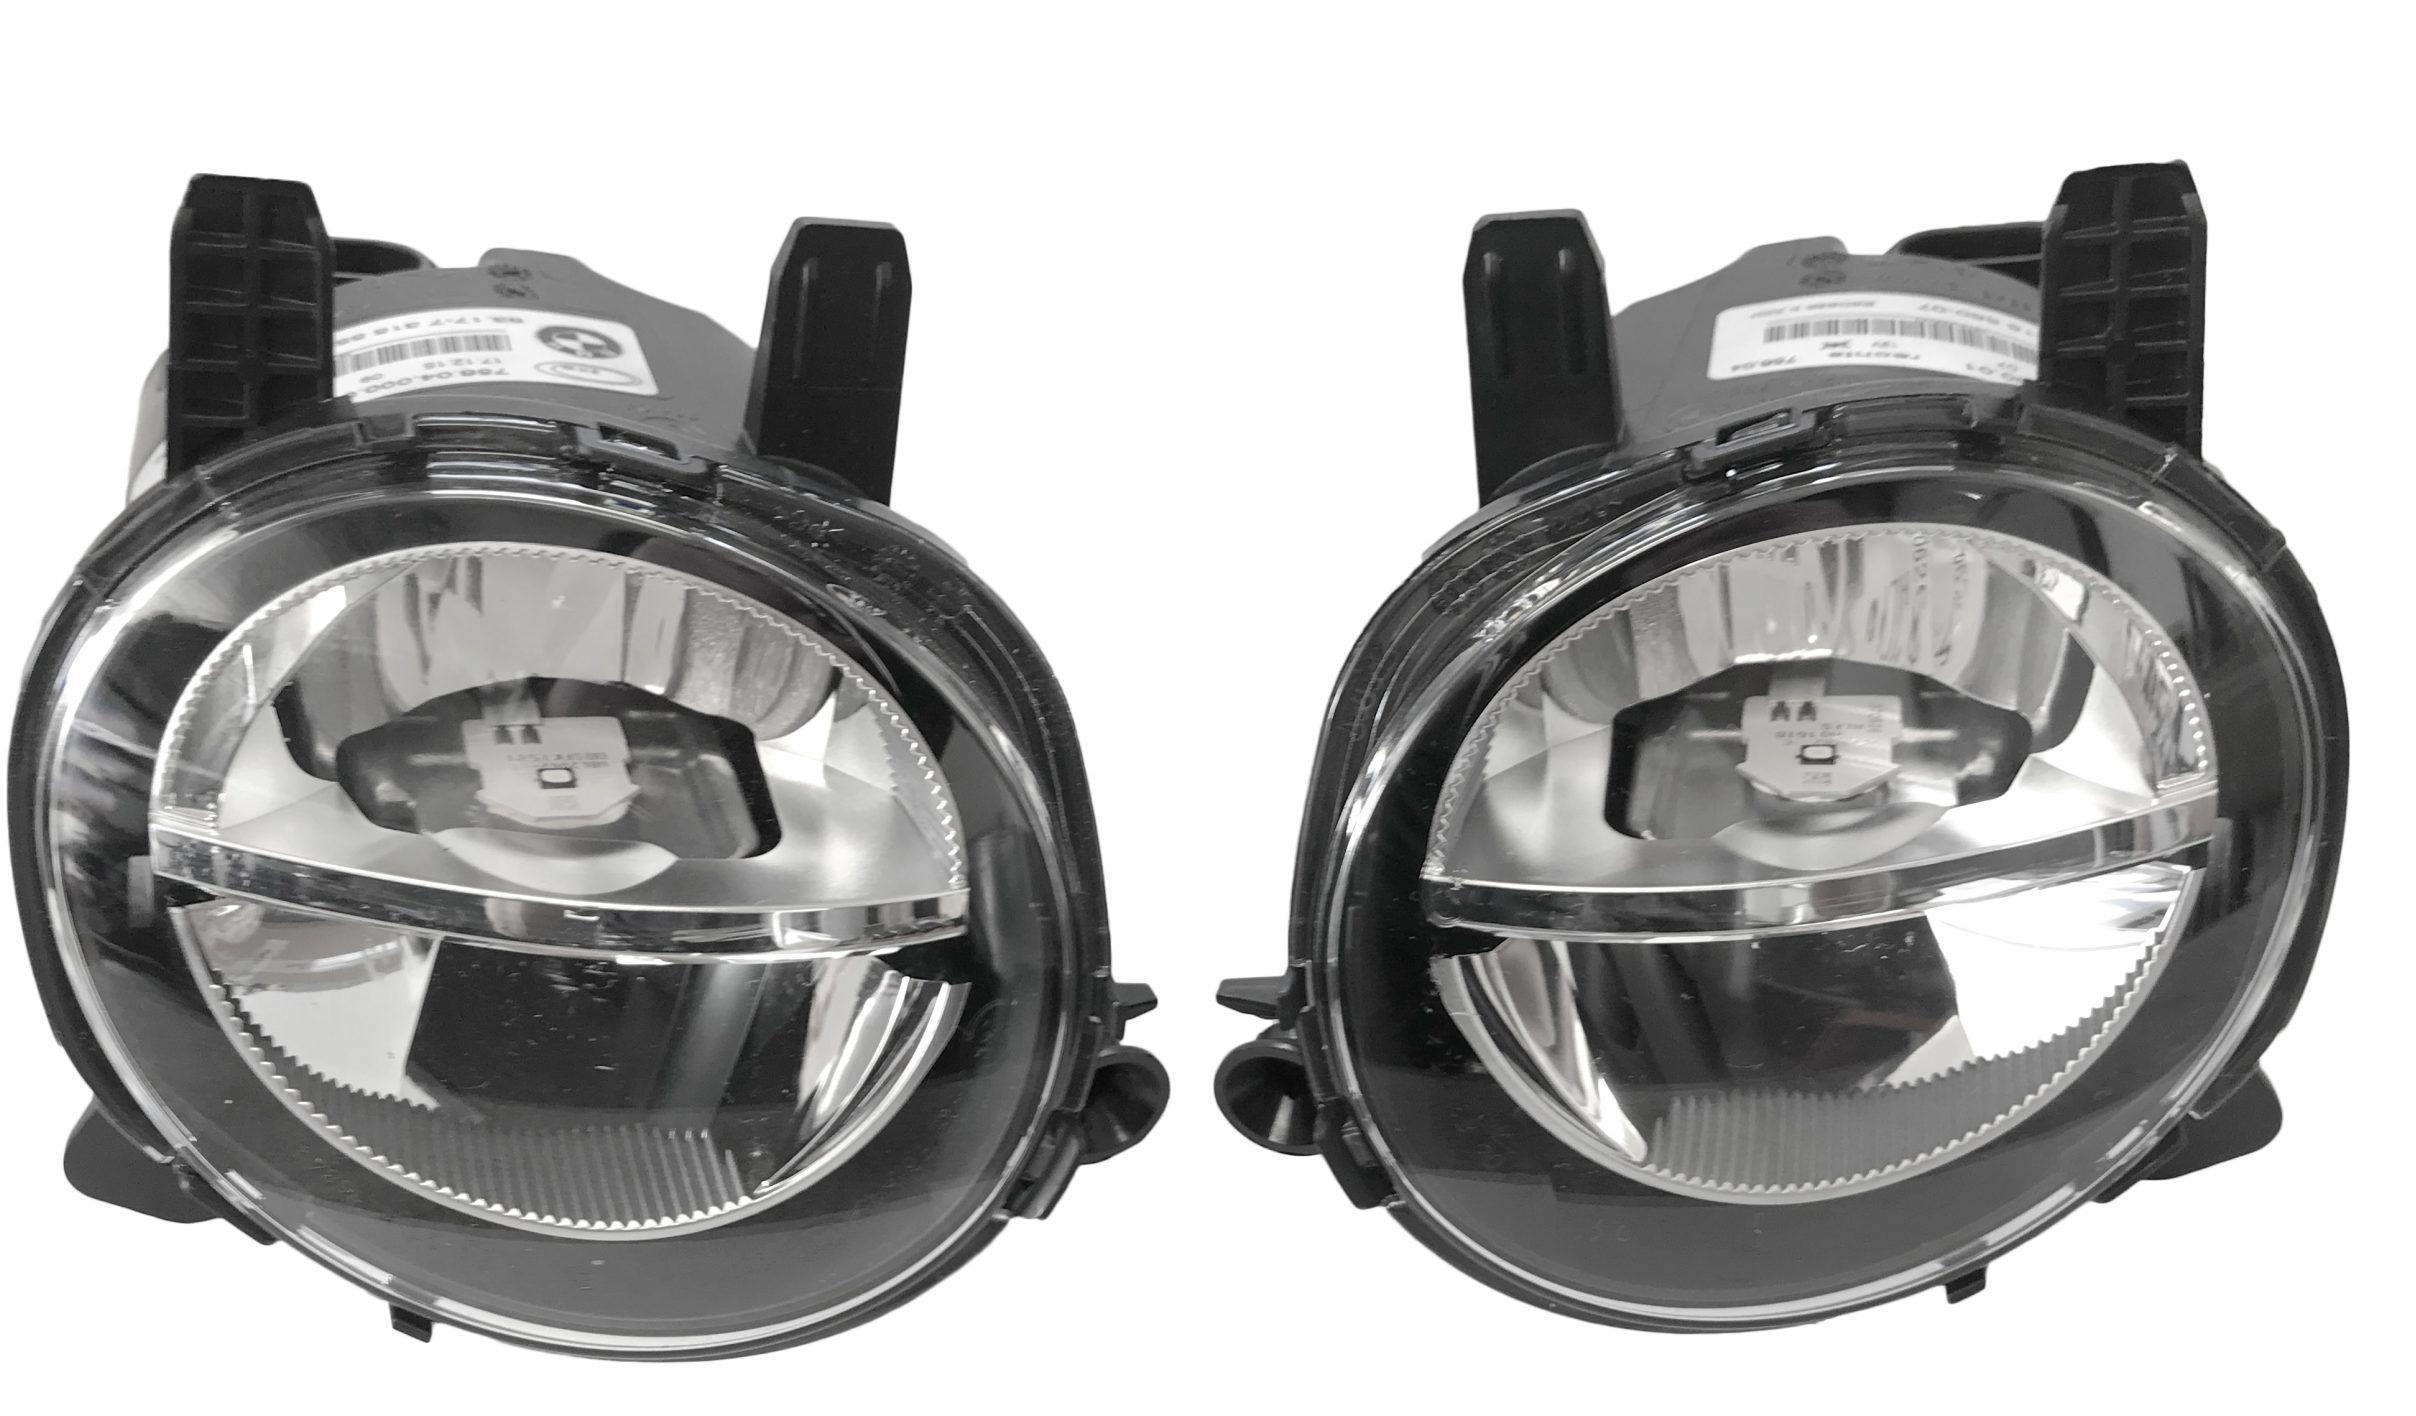 2x Nowe Oryginalne Halogeny Halogen Fog LED Bmw 3 F30 F31 M3 4 F32 F33 F36 7315560